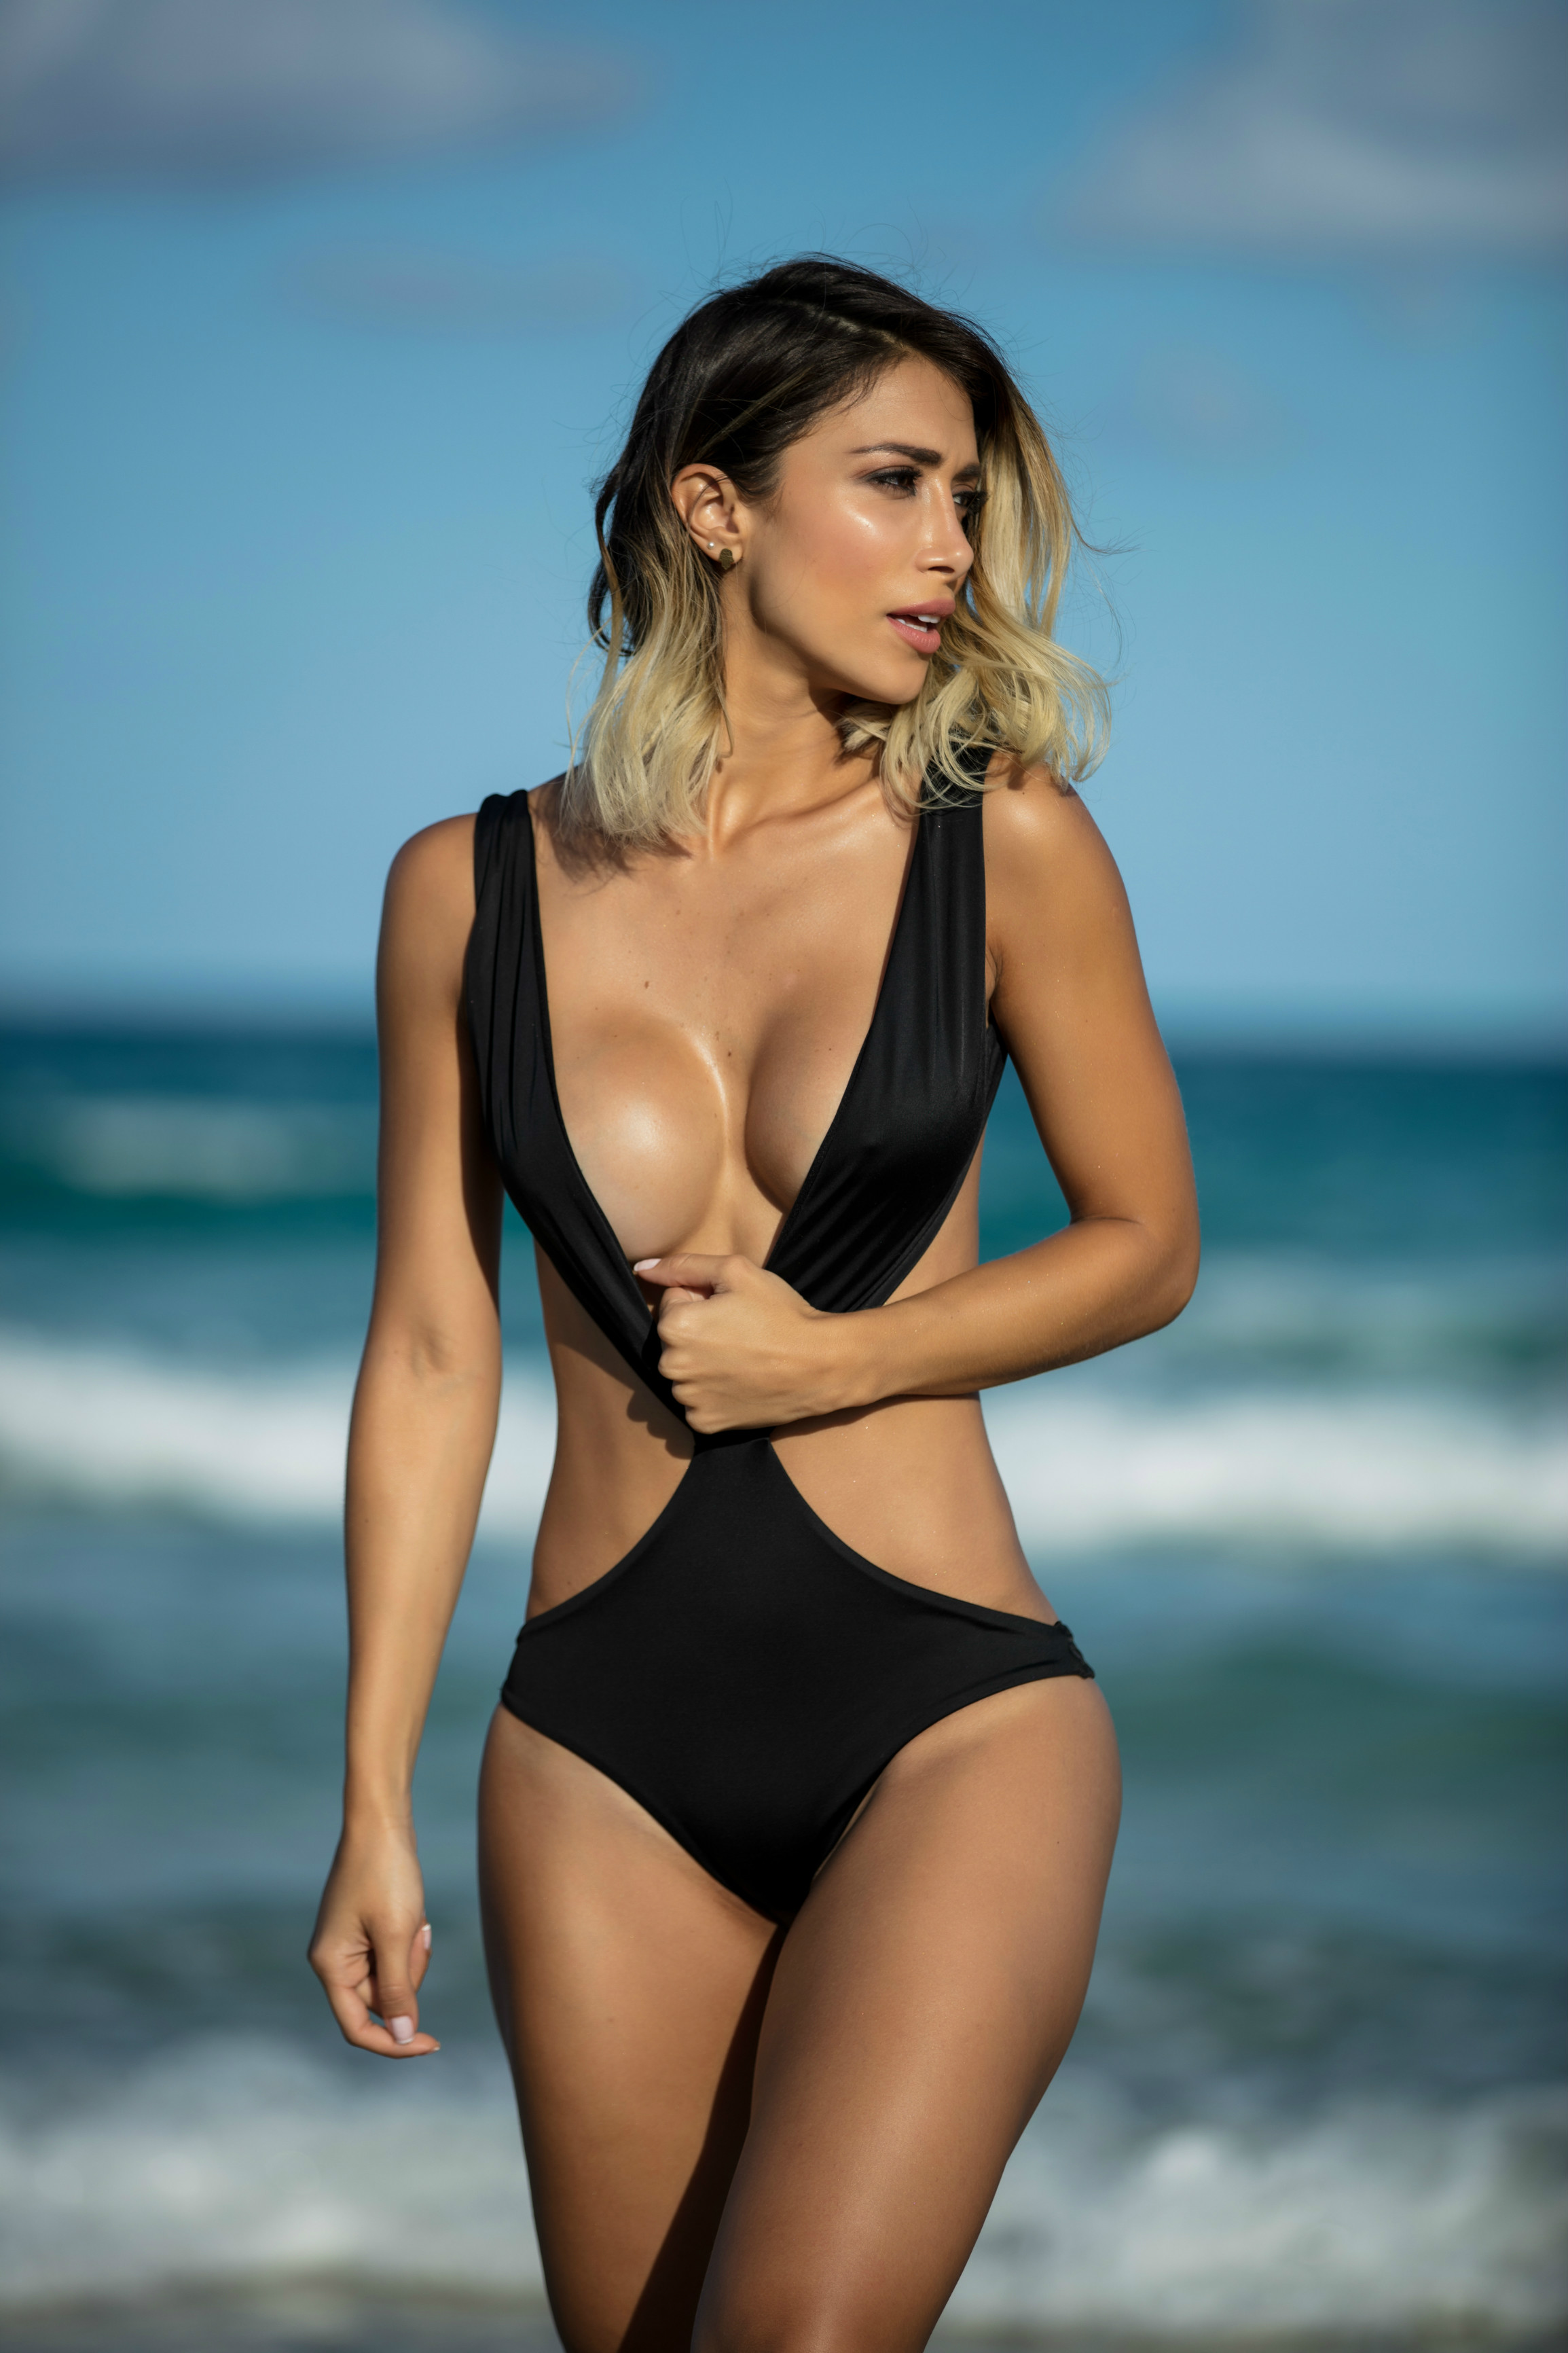 Photos Valeria Moreno nude (99 photos), Ass, Cleavage, Feet, underwear 2017